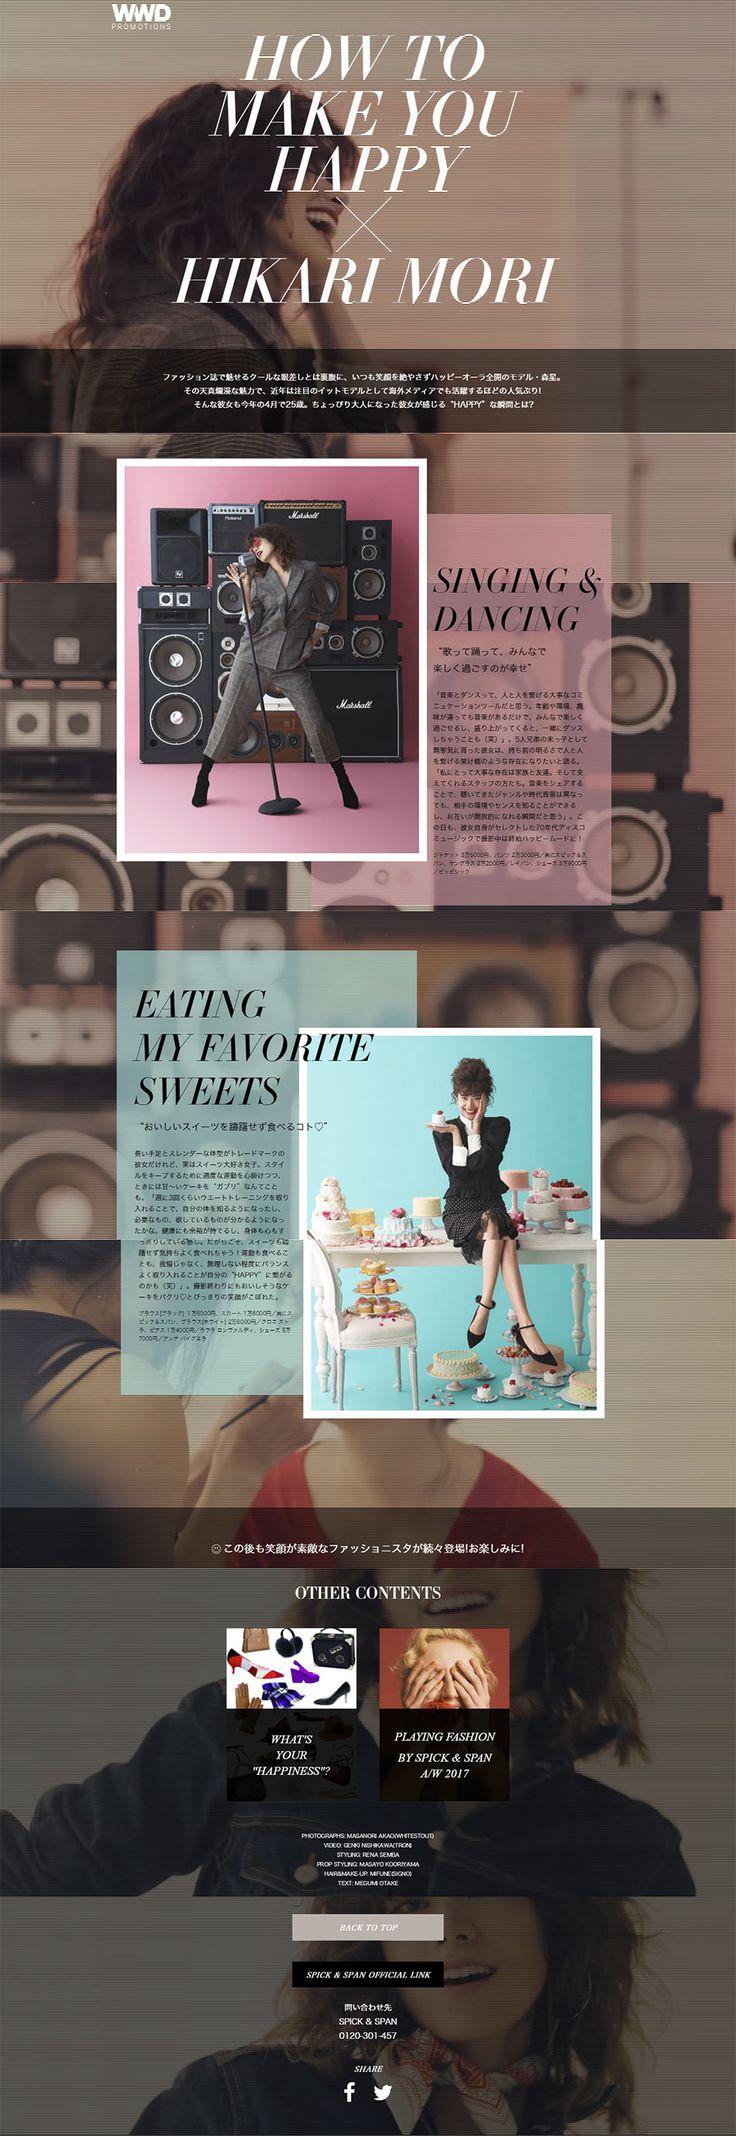 WWD様の「HOW+TO+MAKE+YOU+HAPPY×HIKARI+MORI」のランディングページ(LP)シンプル系|ファッション